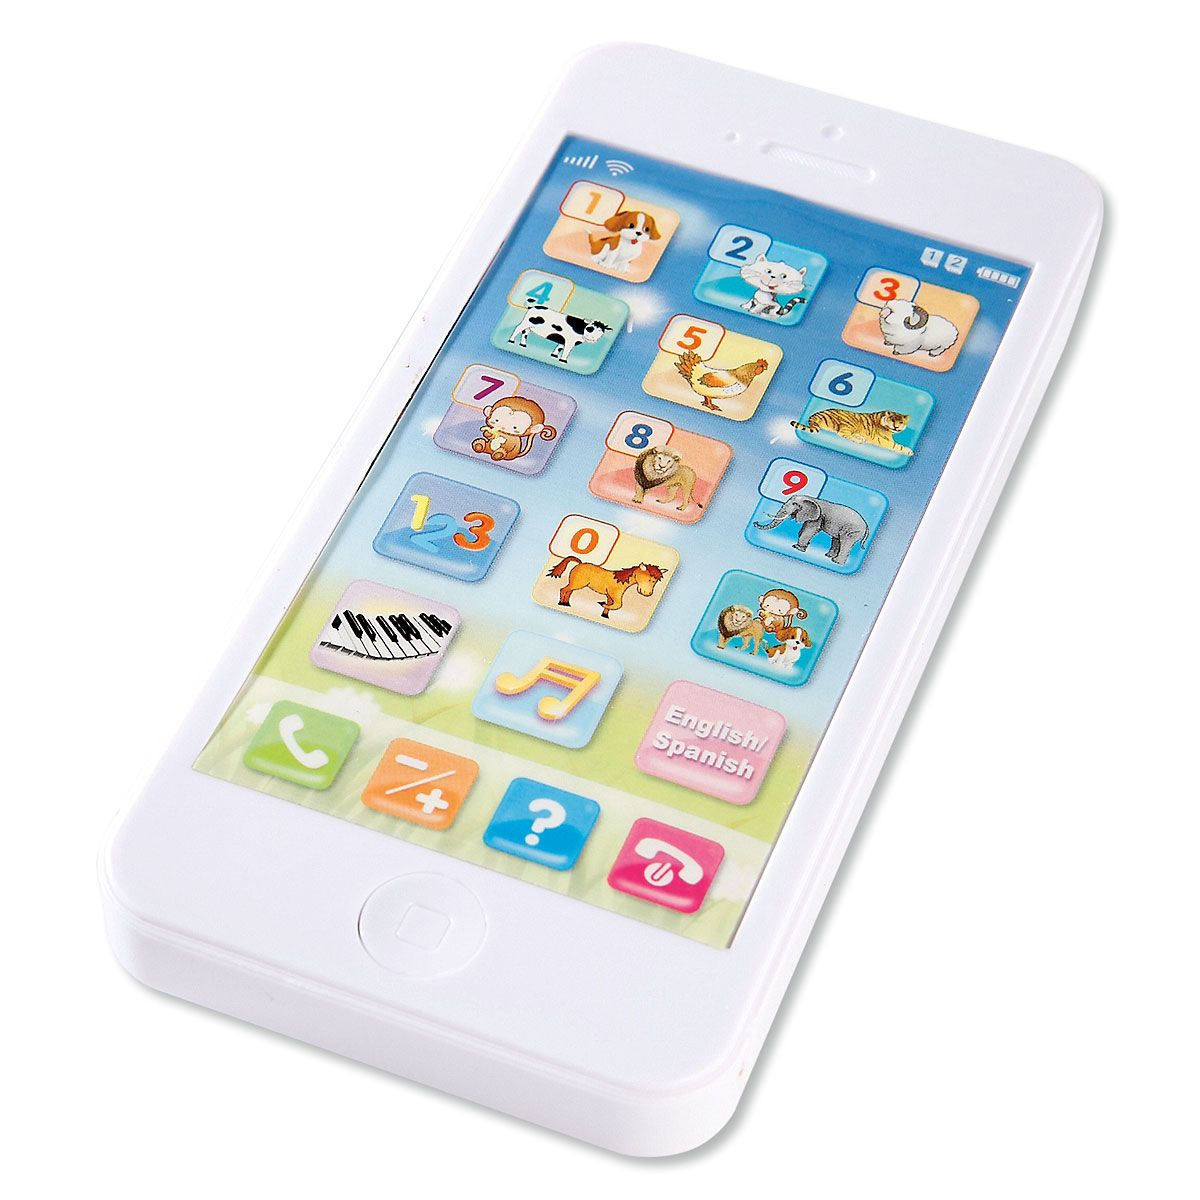 Pretend Play Smart Phone